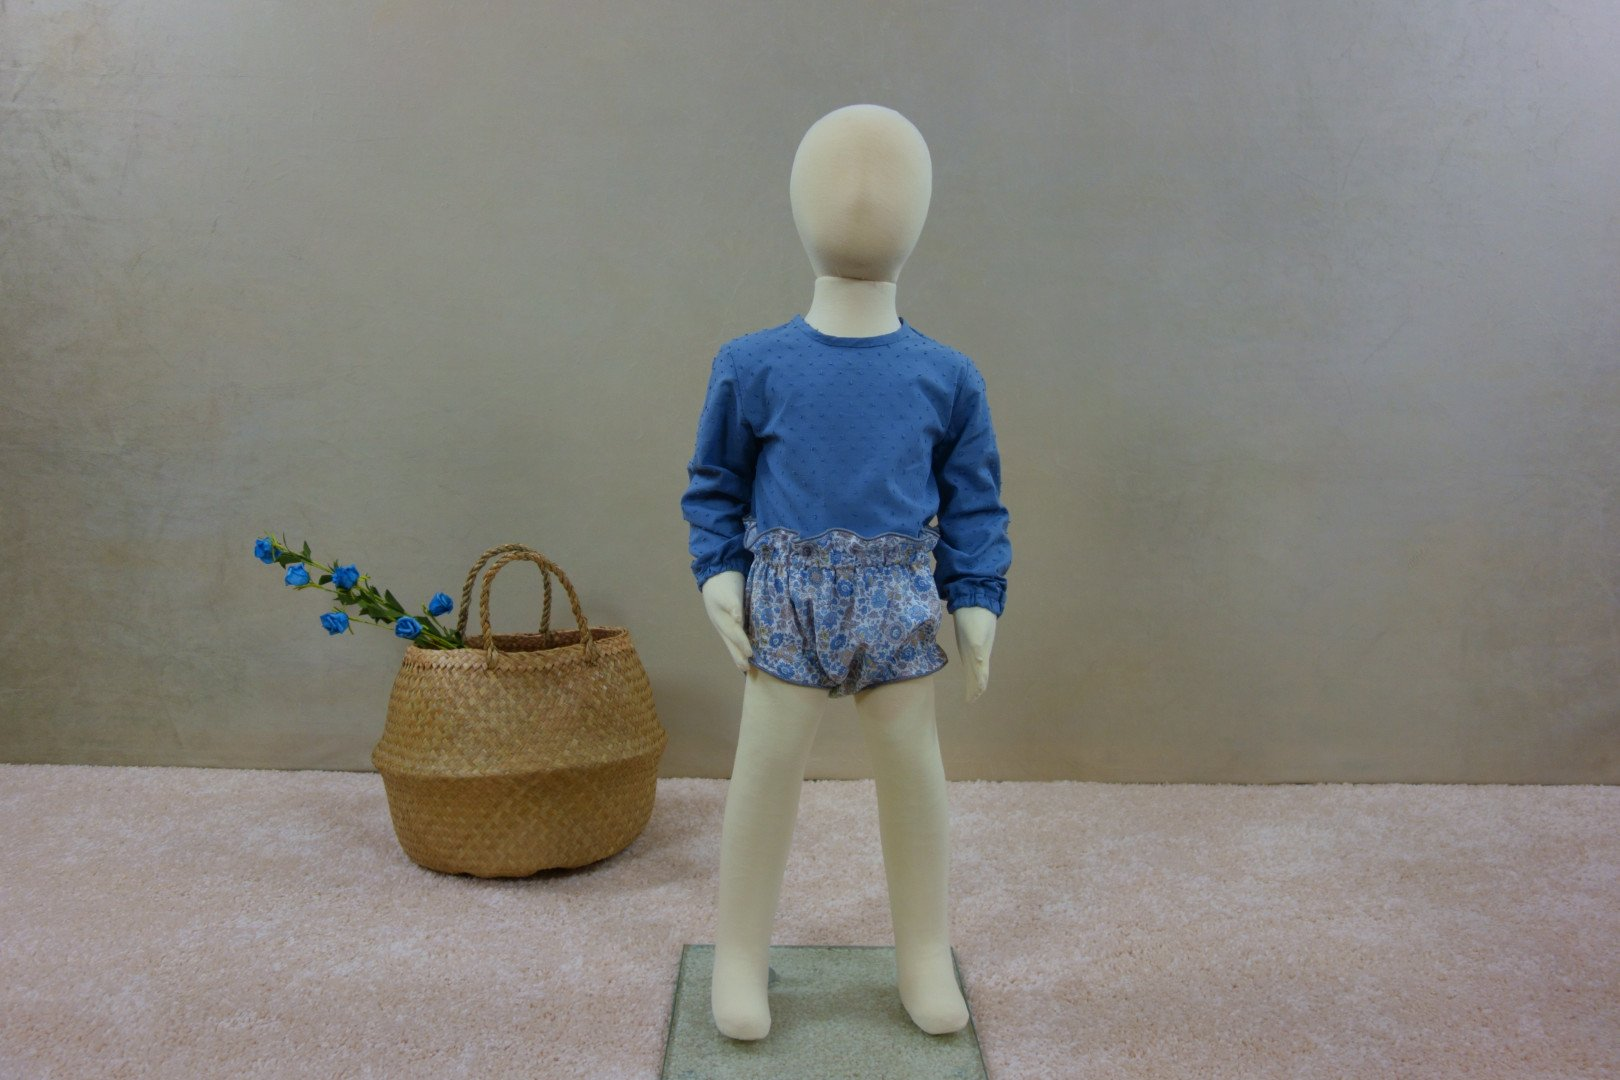 Exposición maniquí niño con ranita liberty Alexandre y camisa plumeti